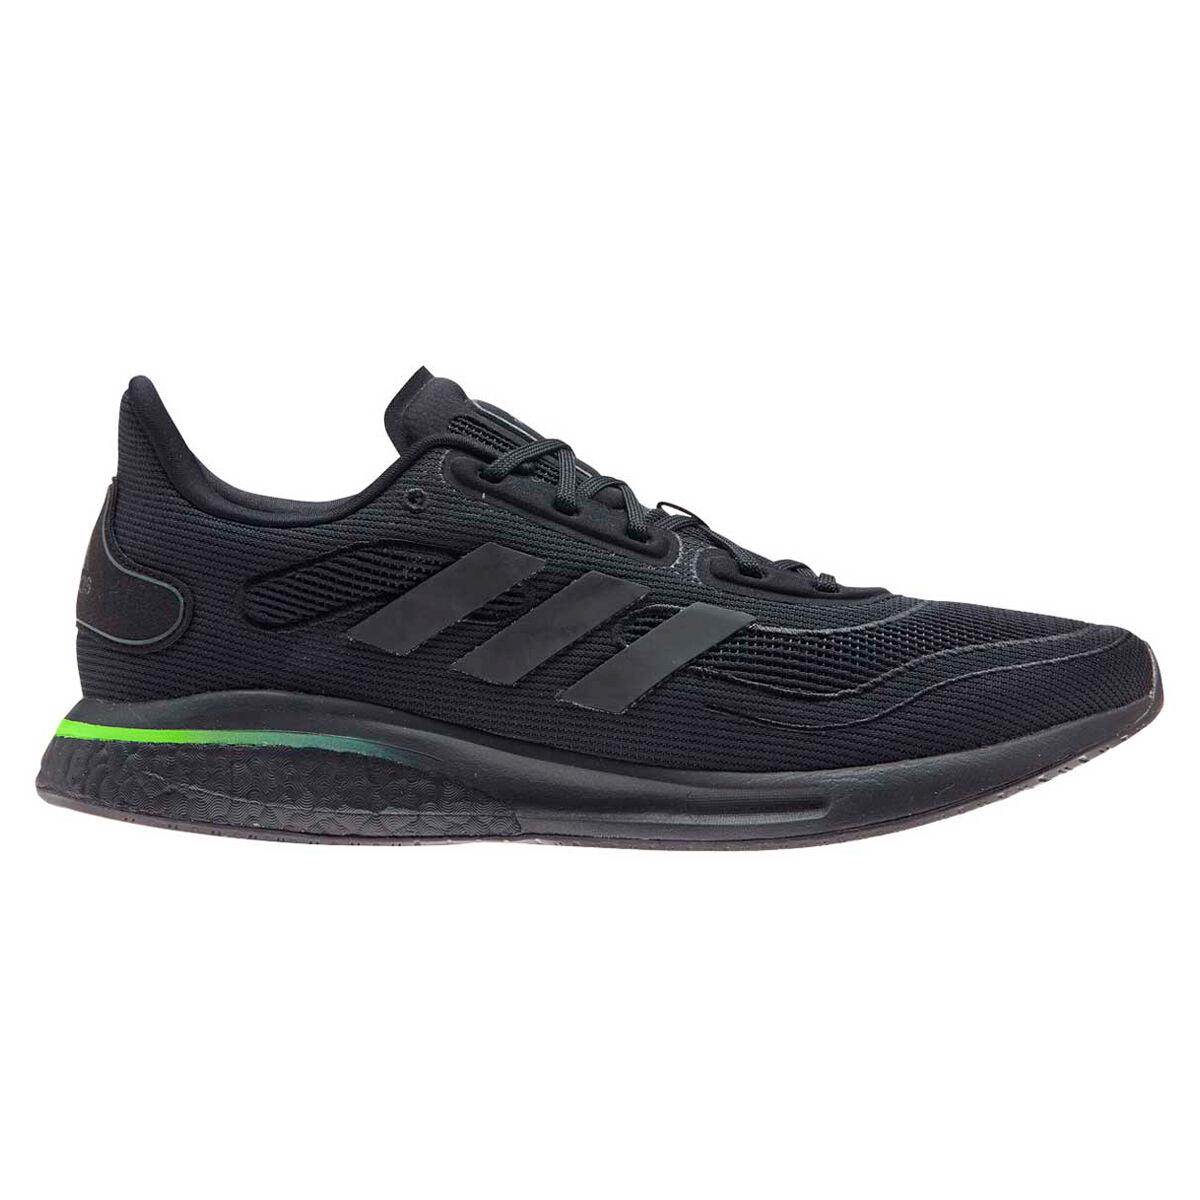 adidas Supernova Mens Running Shoes